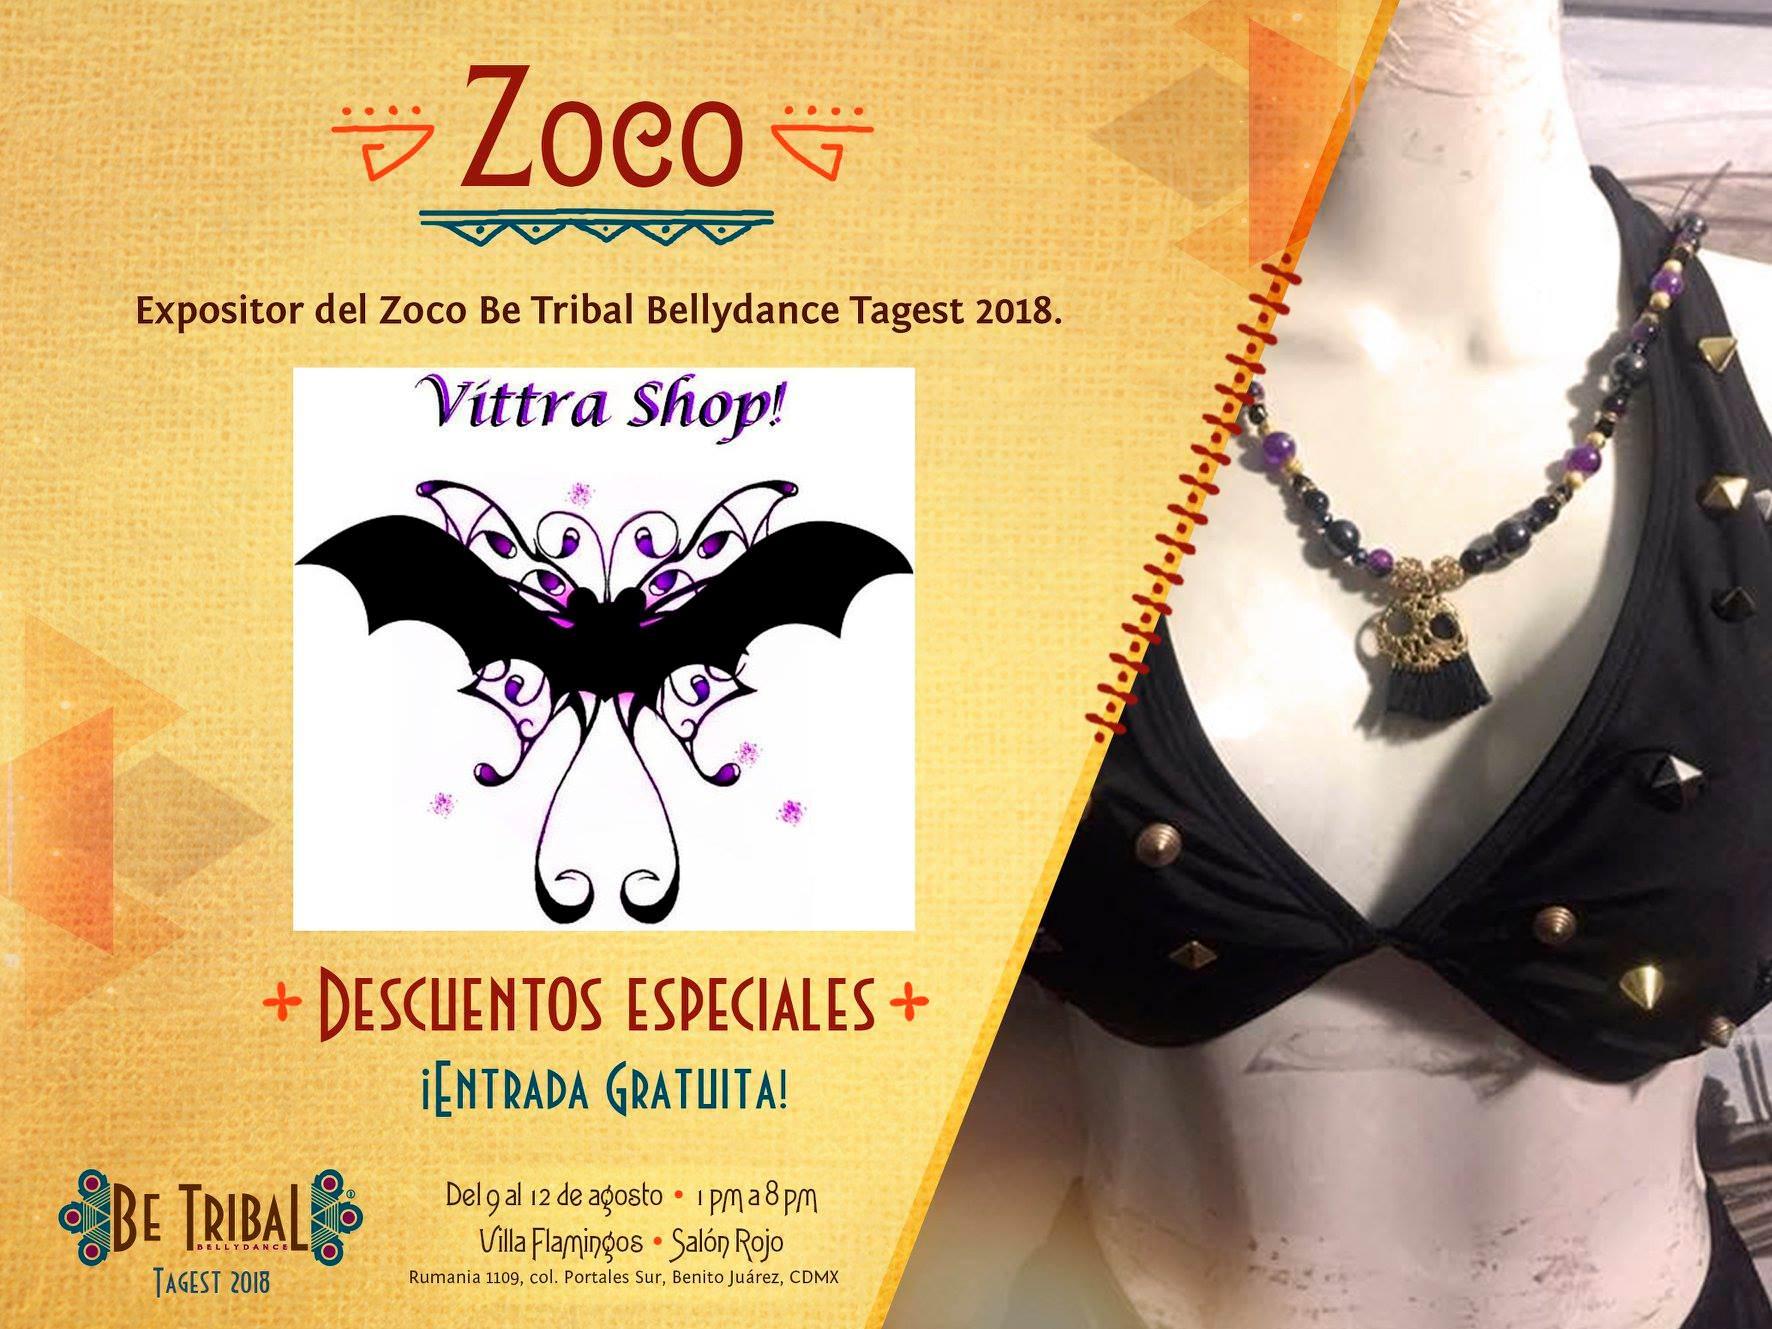 2018 Zoco Vittra Shop